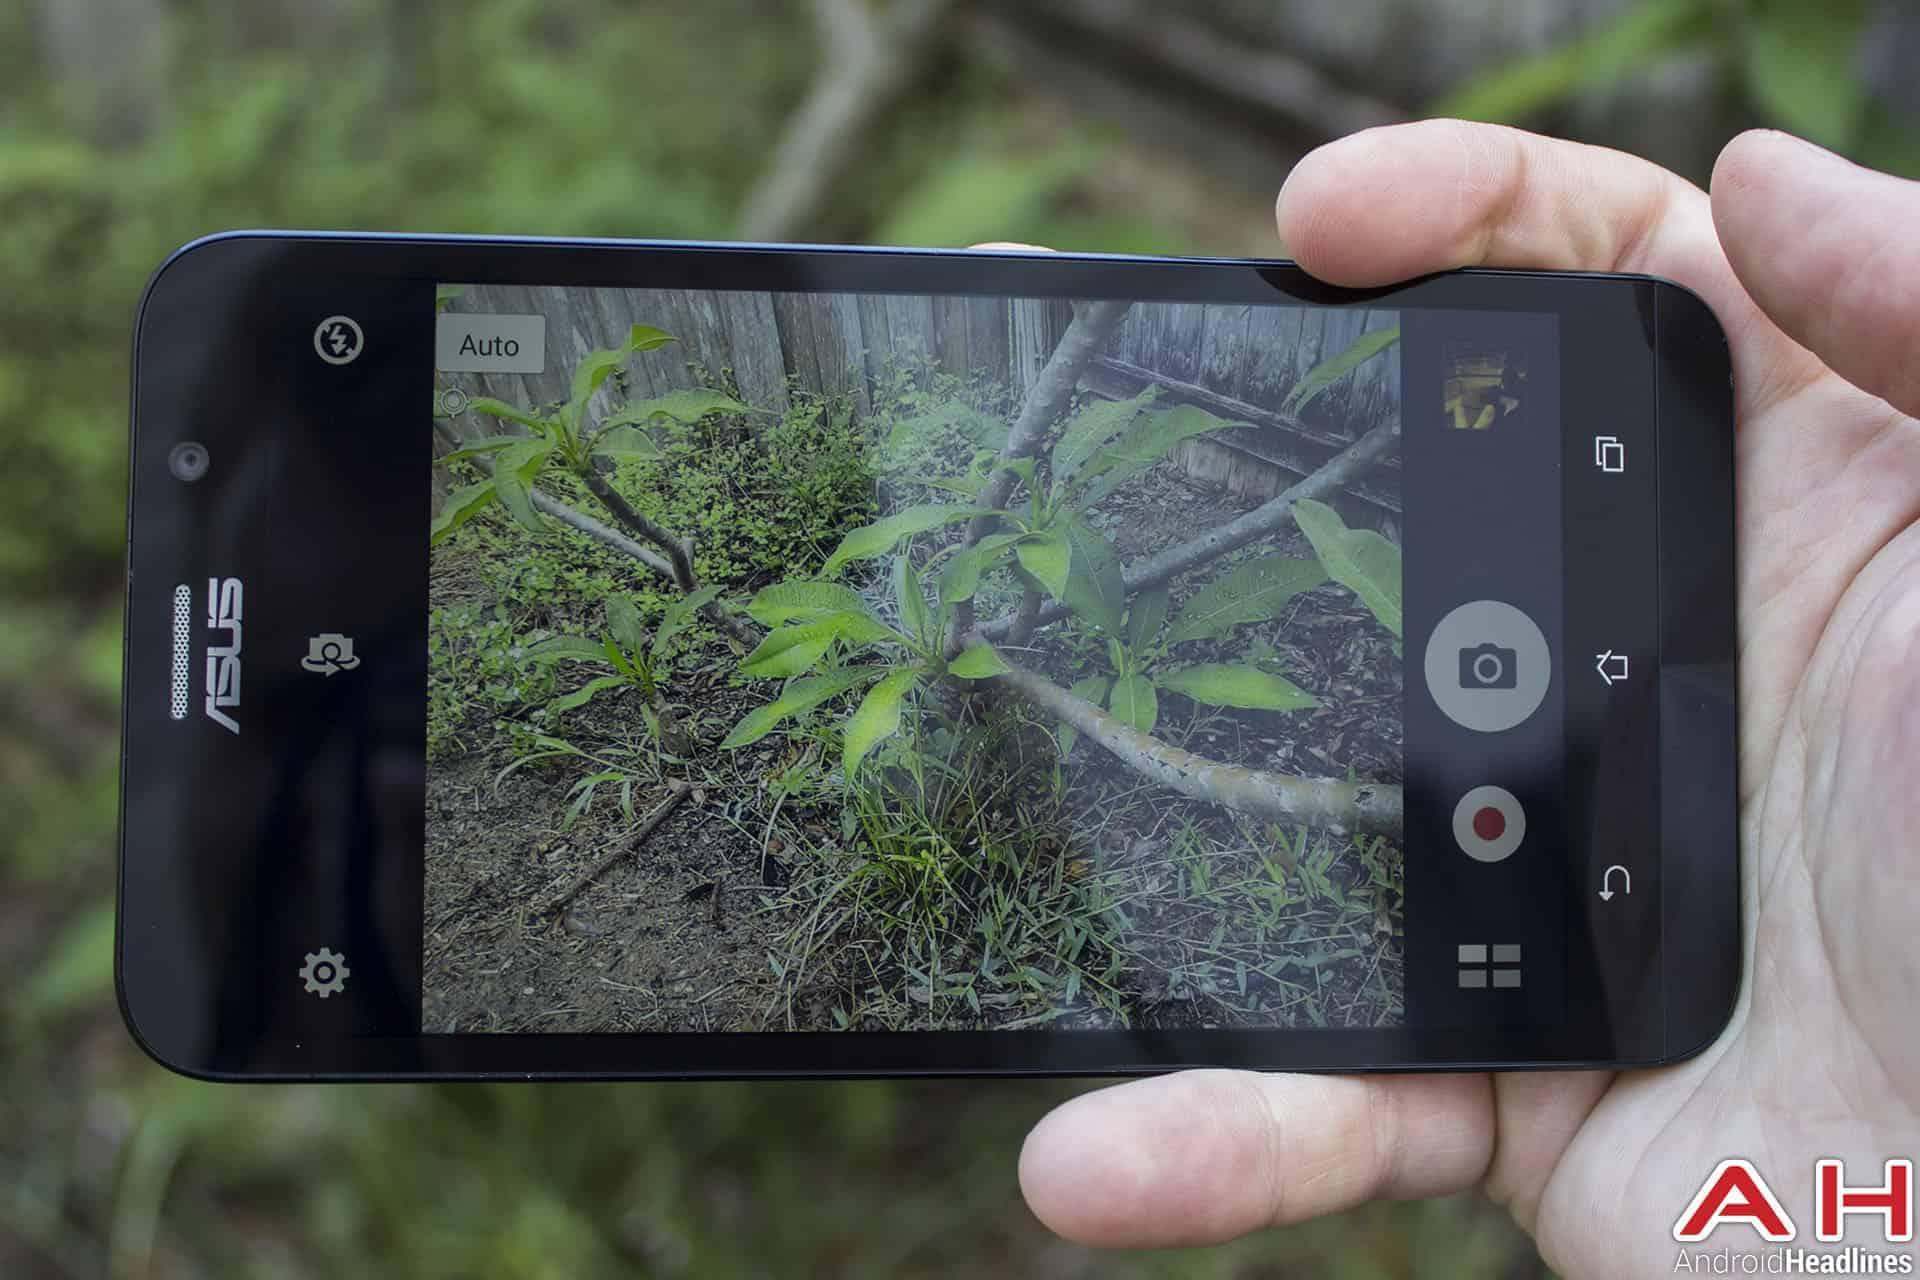 Asus-zenfone-2-camera